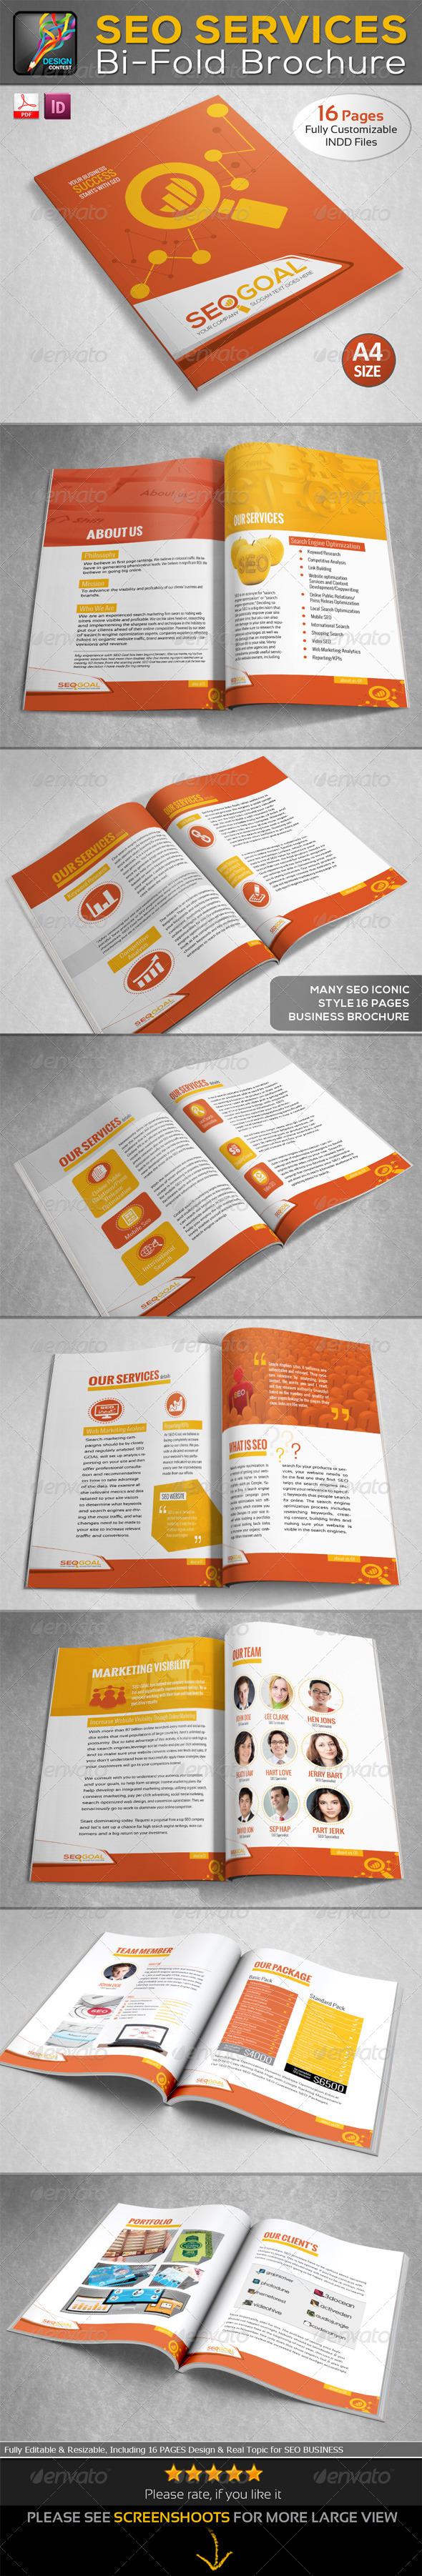 GraphicRiver SEO Goal SEO Services Bi-fold Brochure 6574493